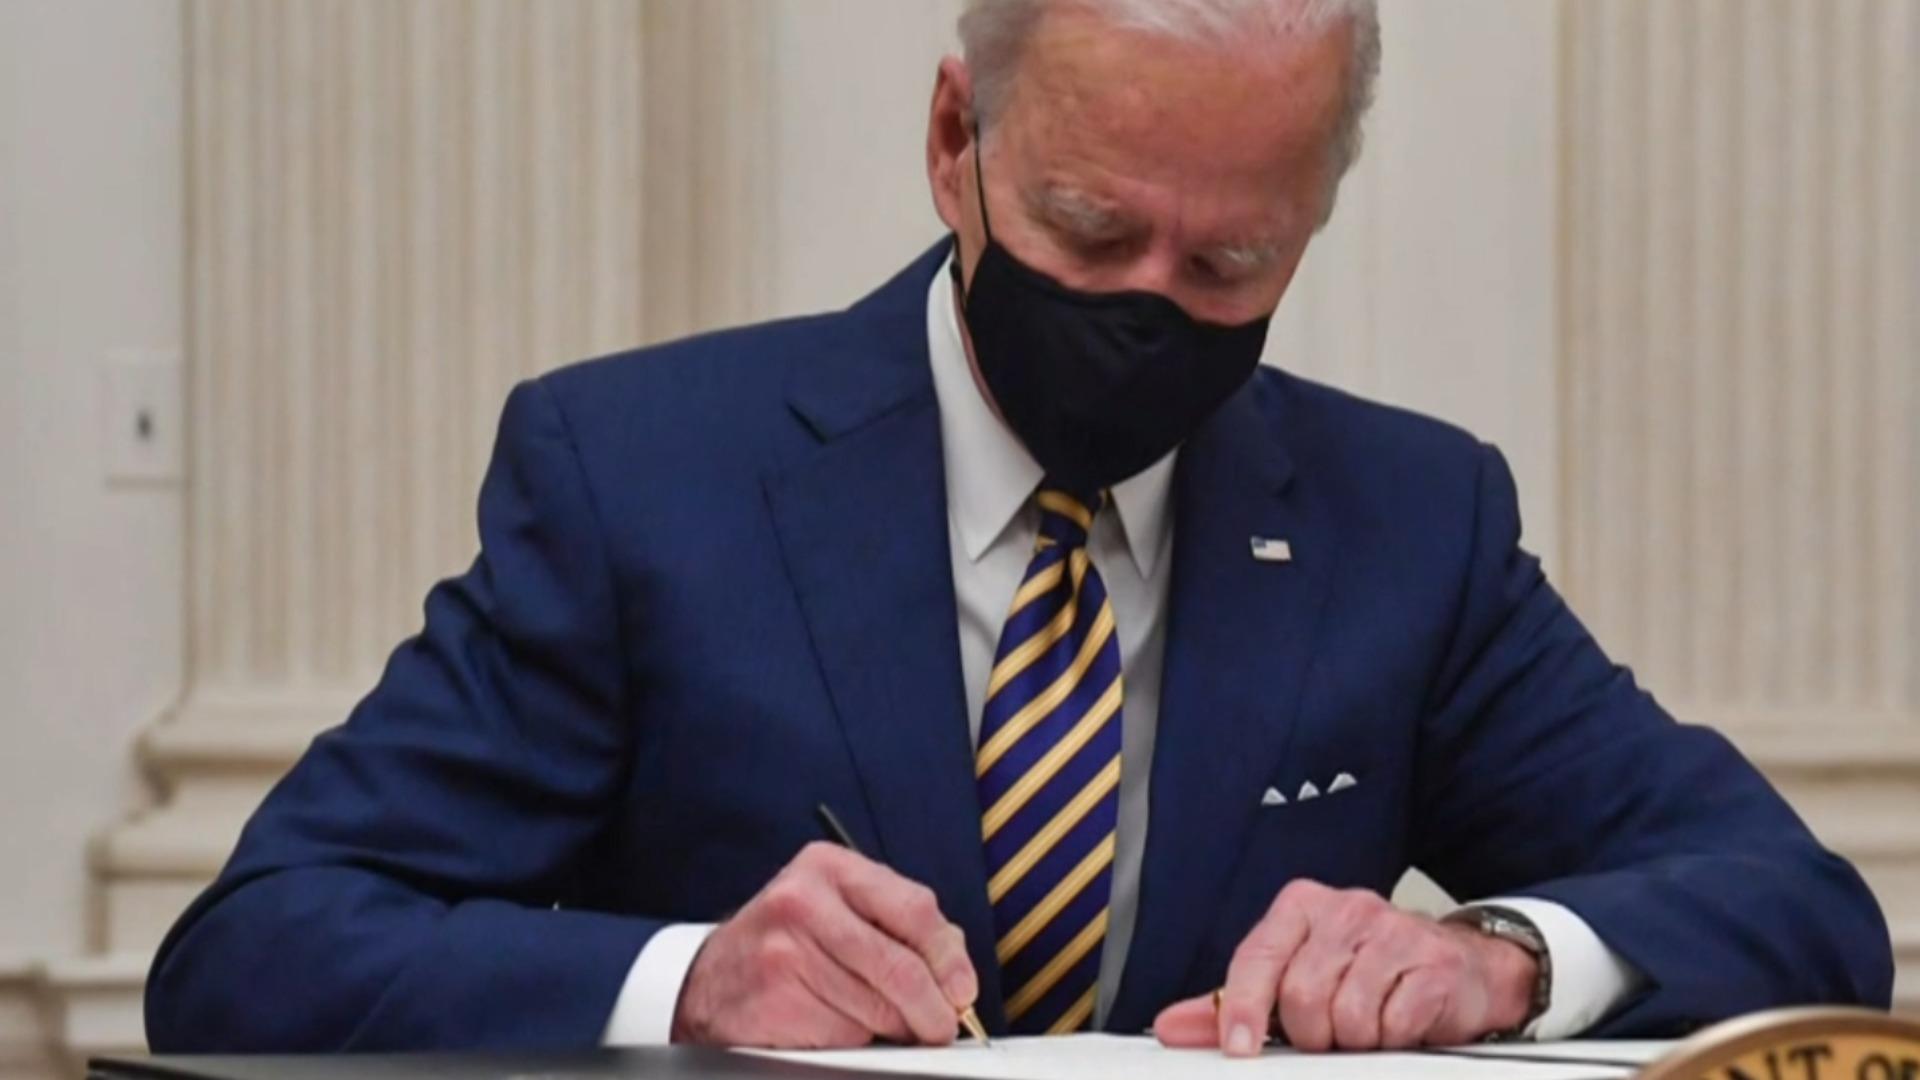 news.yahoo.com: President Biden kicks off term with flurry of executive orders